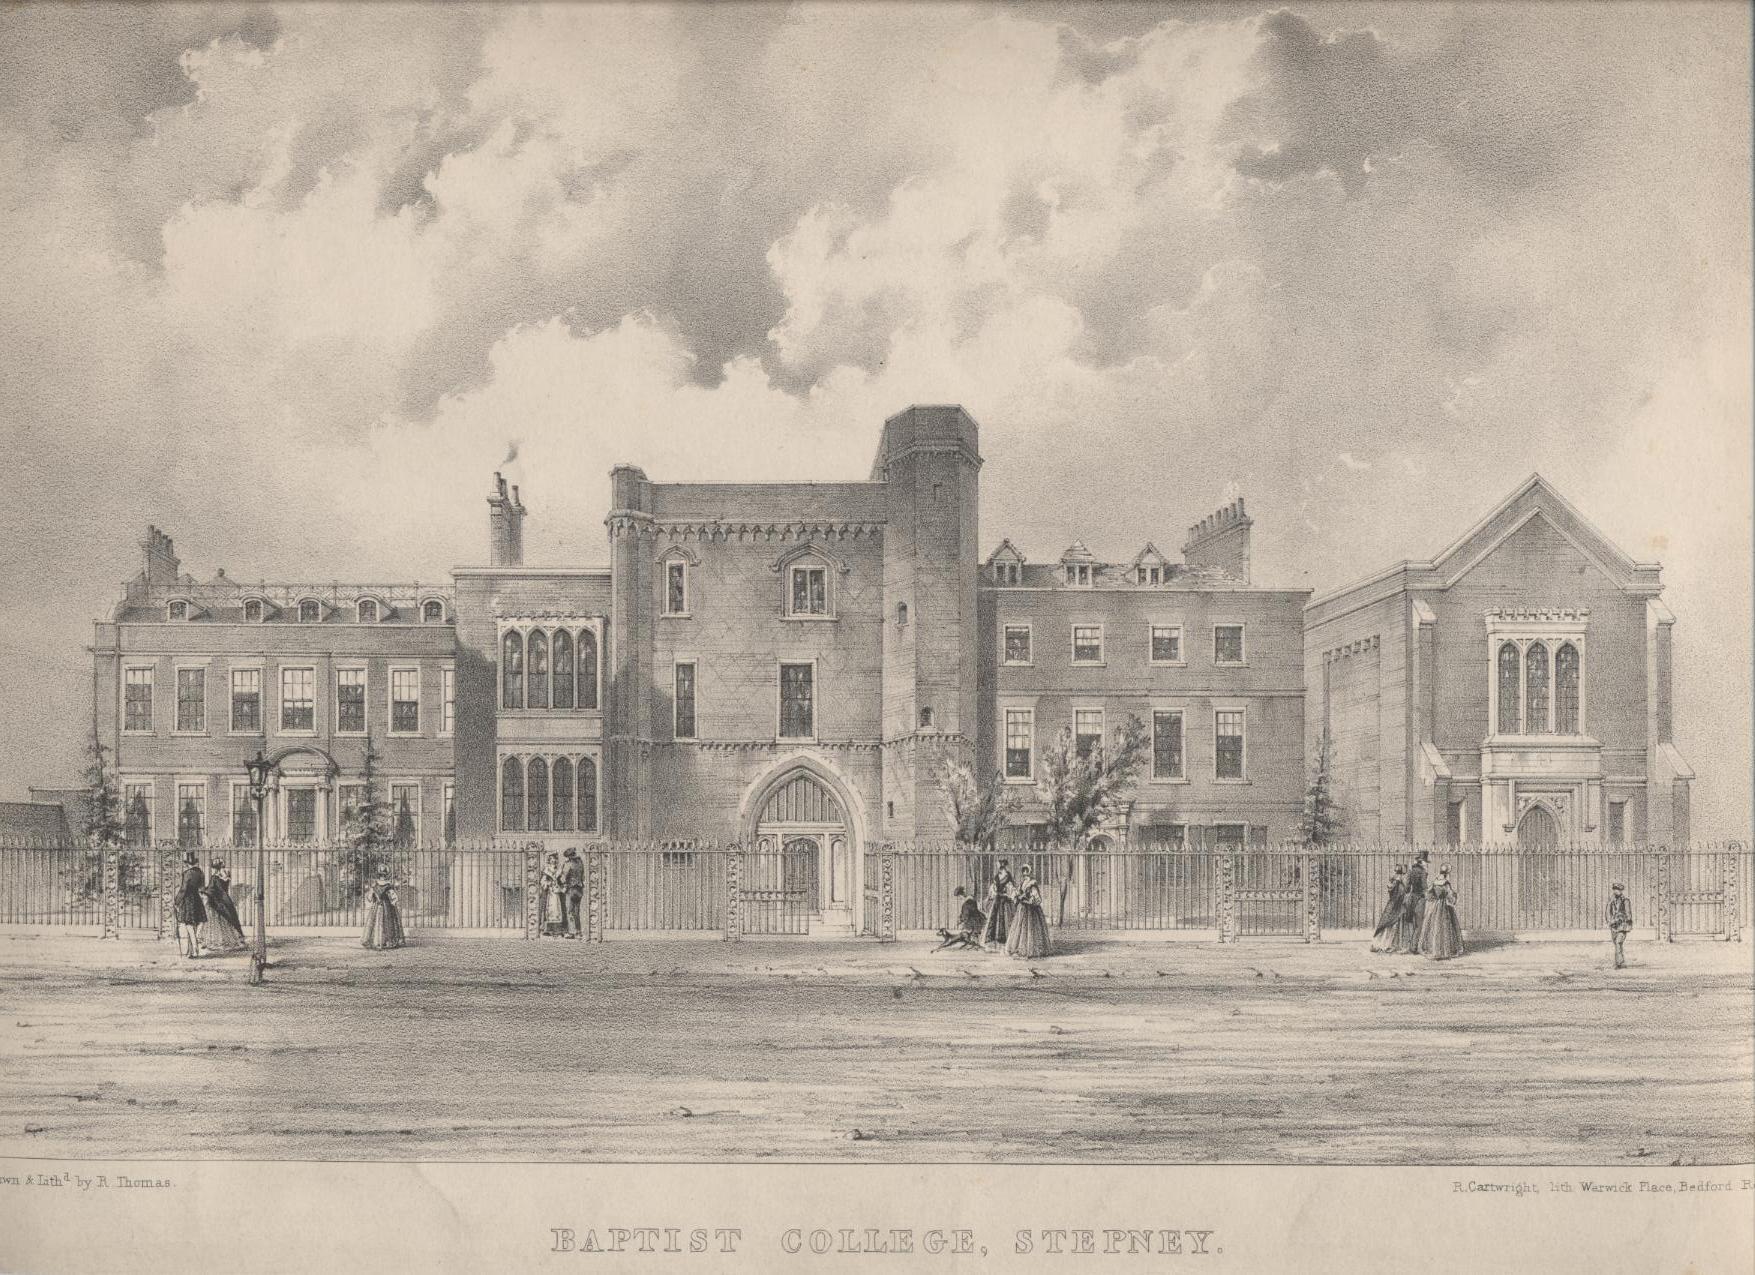 Baptist College, Stepheny